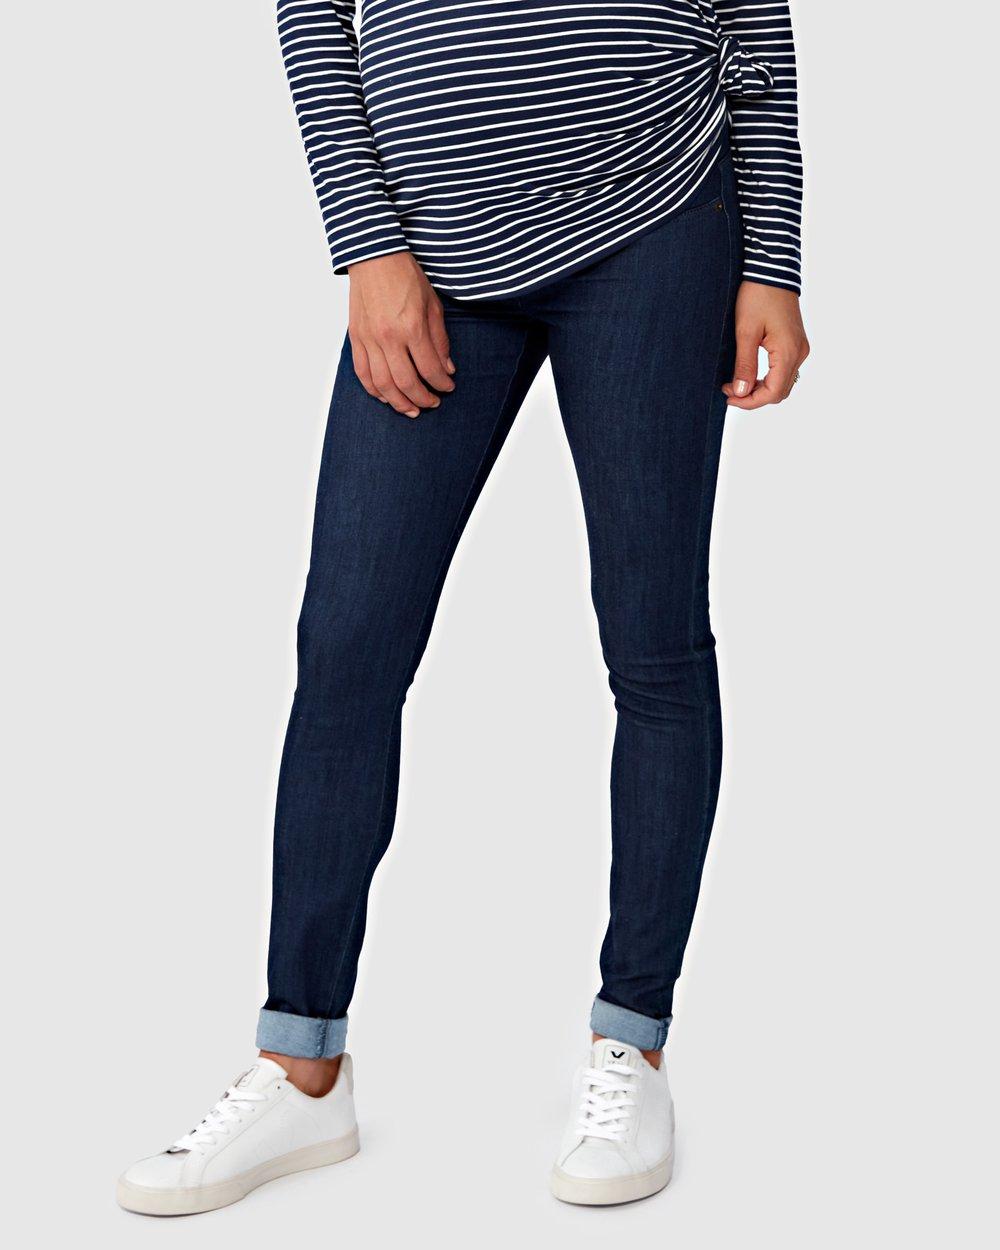 Margot Skinny Jeans By Nike Air Focus 1 Royal Blue Dress Shoes For Girls Online Gov Australia